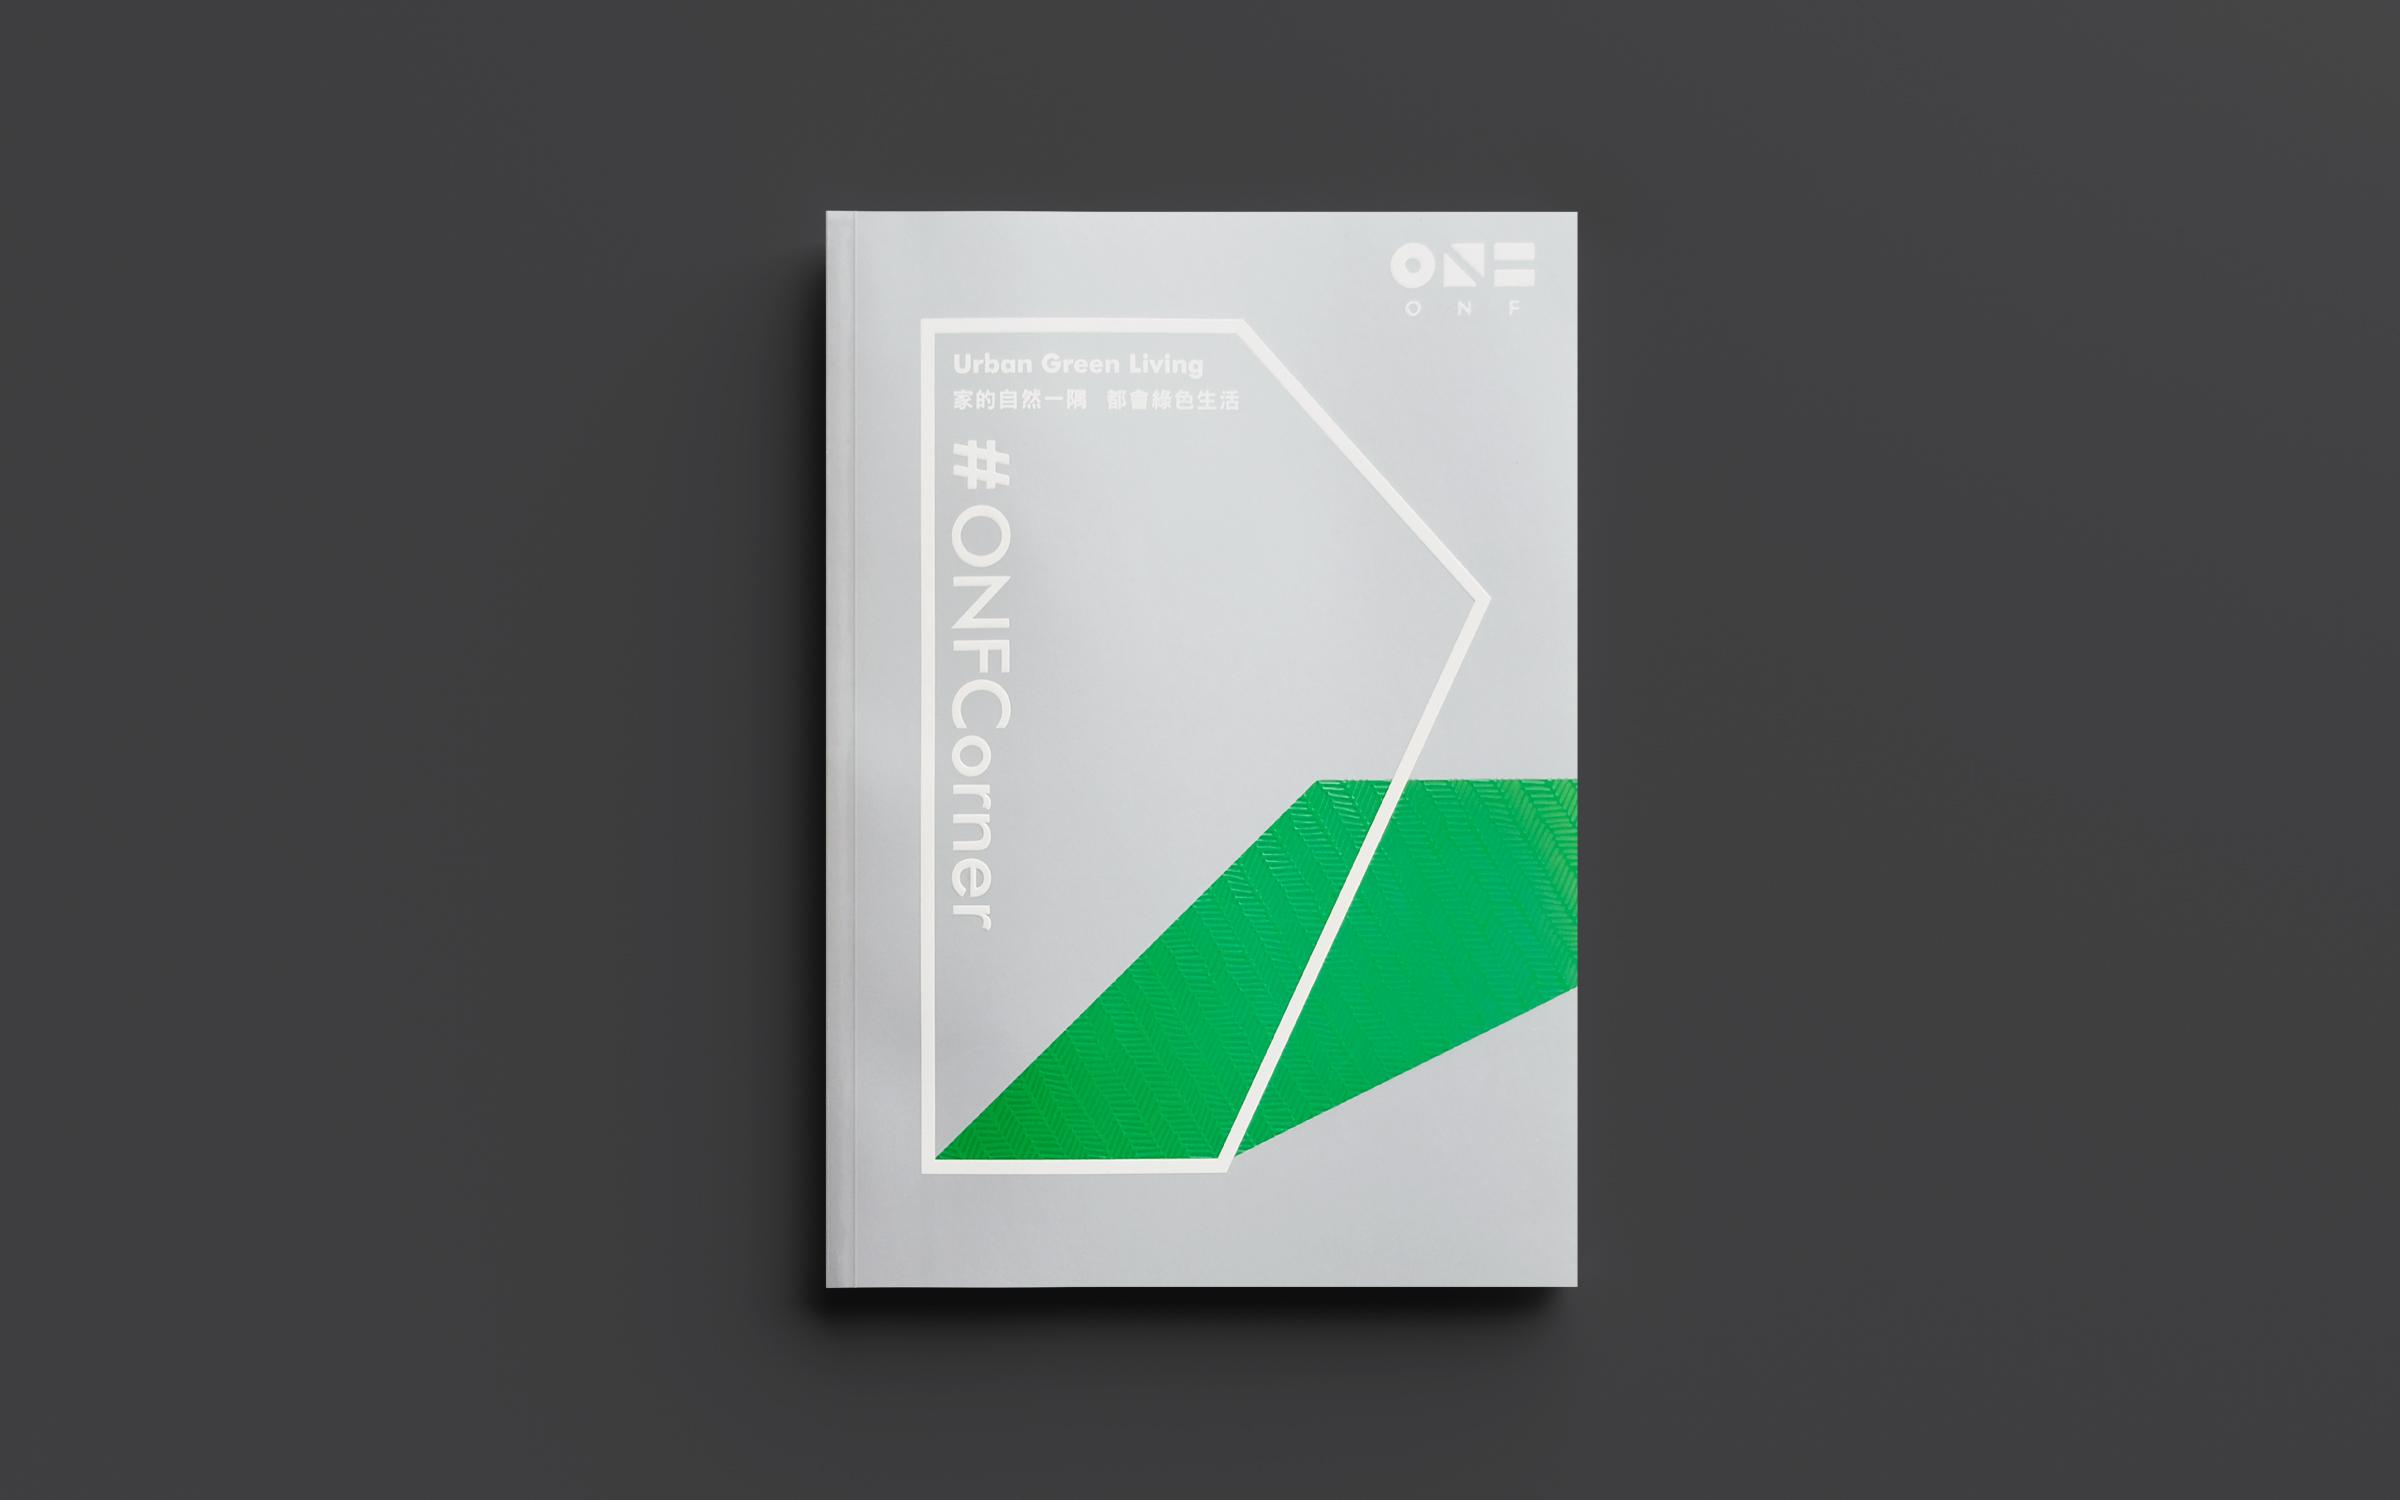 ONF_Book_Slide_01.jpg